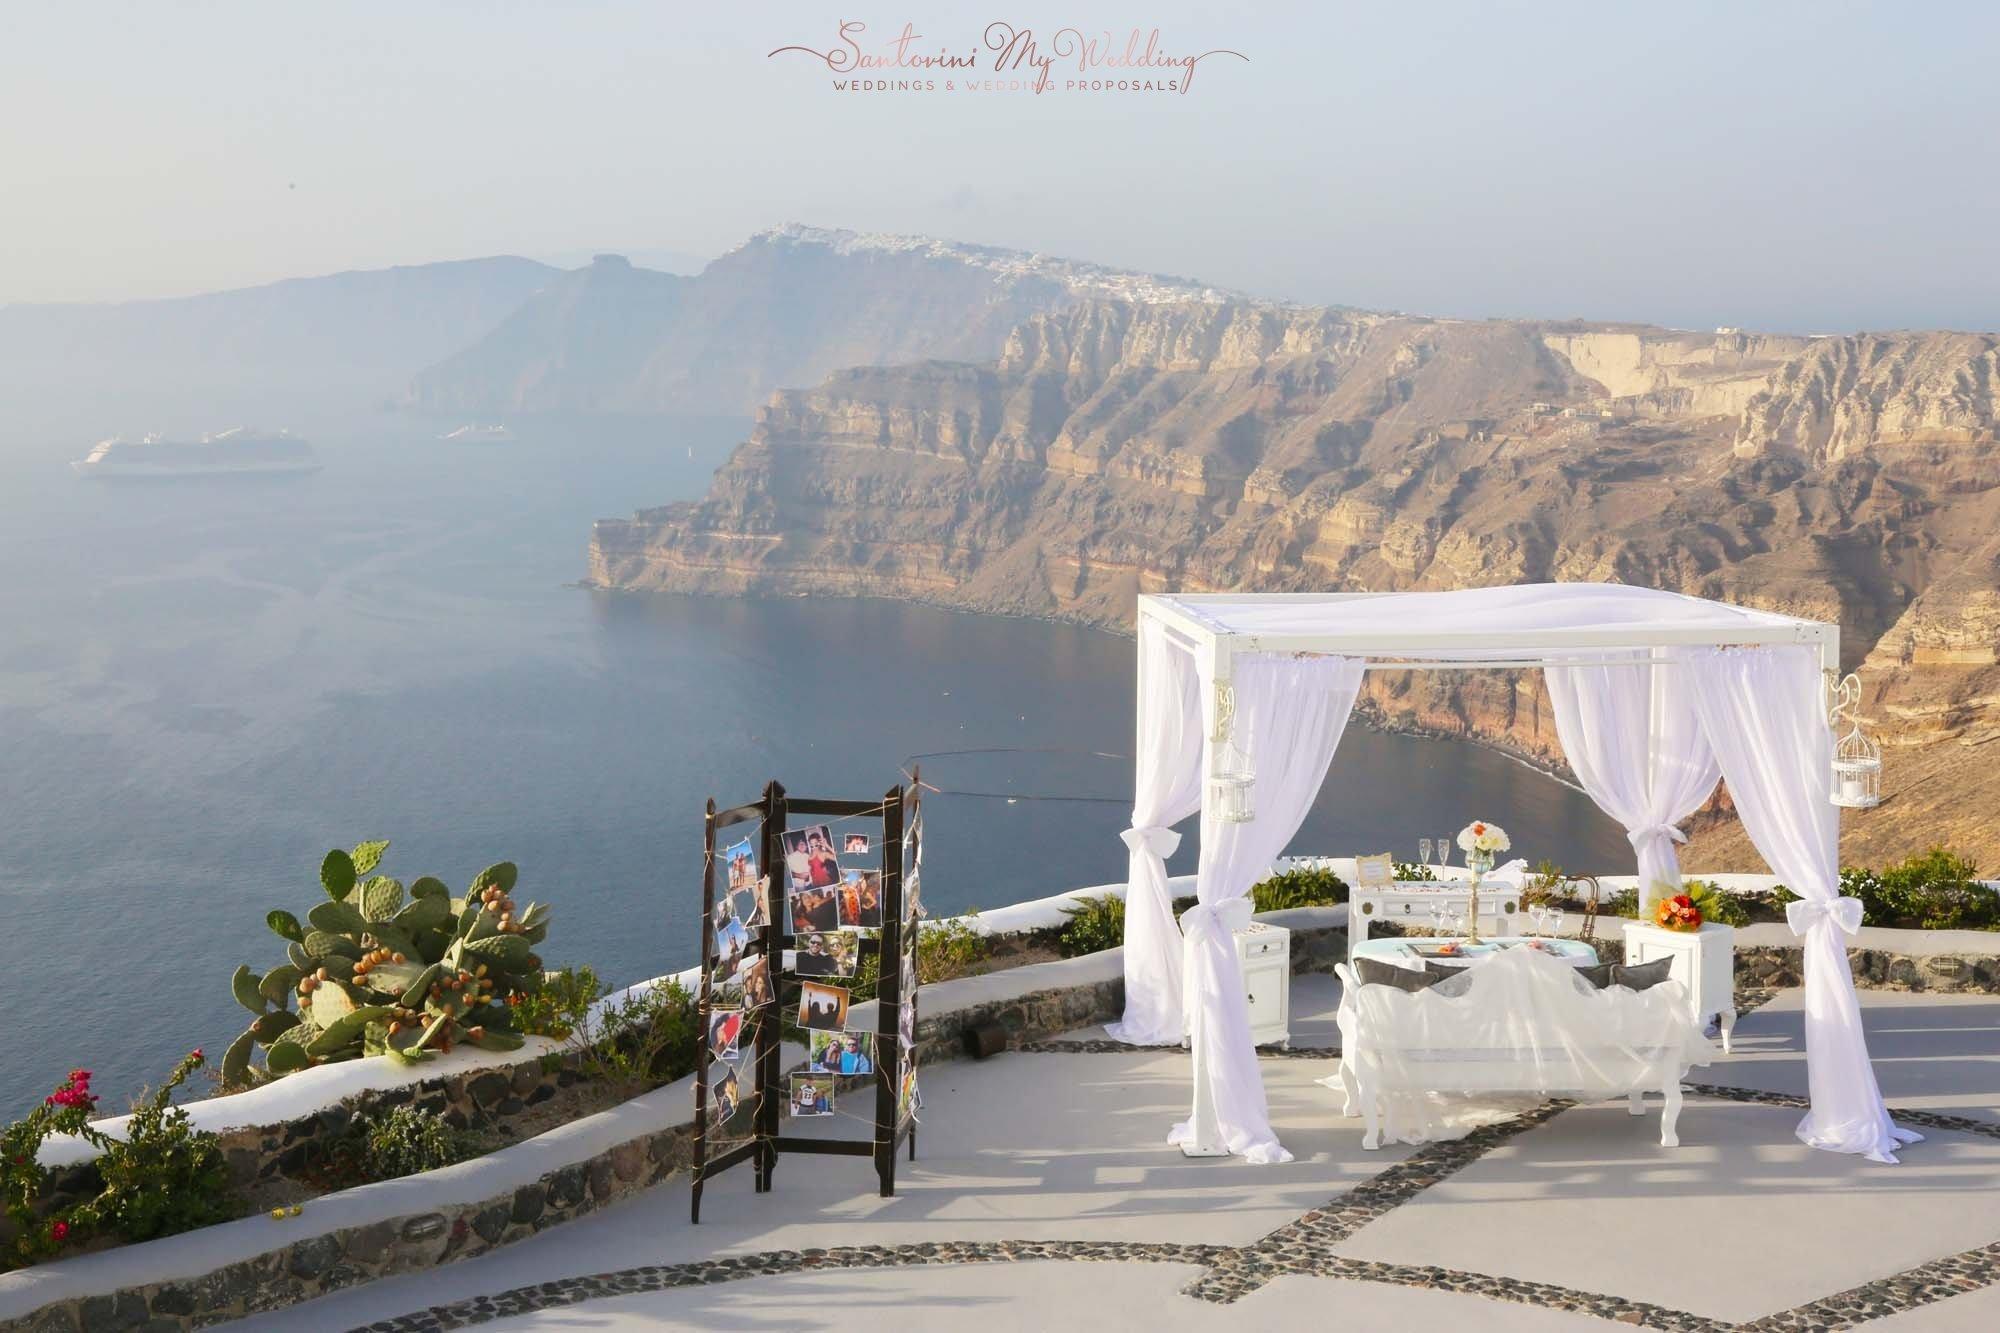 Breathtaking Proposal 1